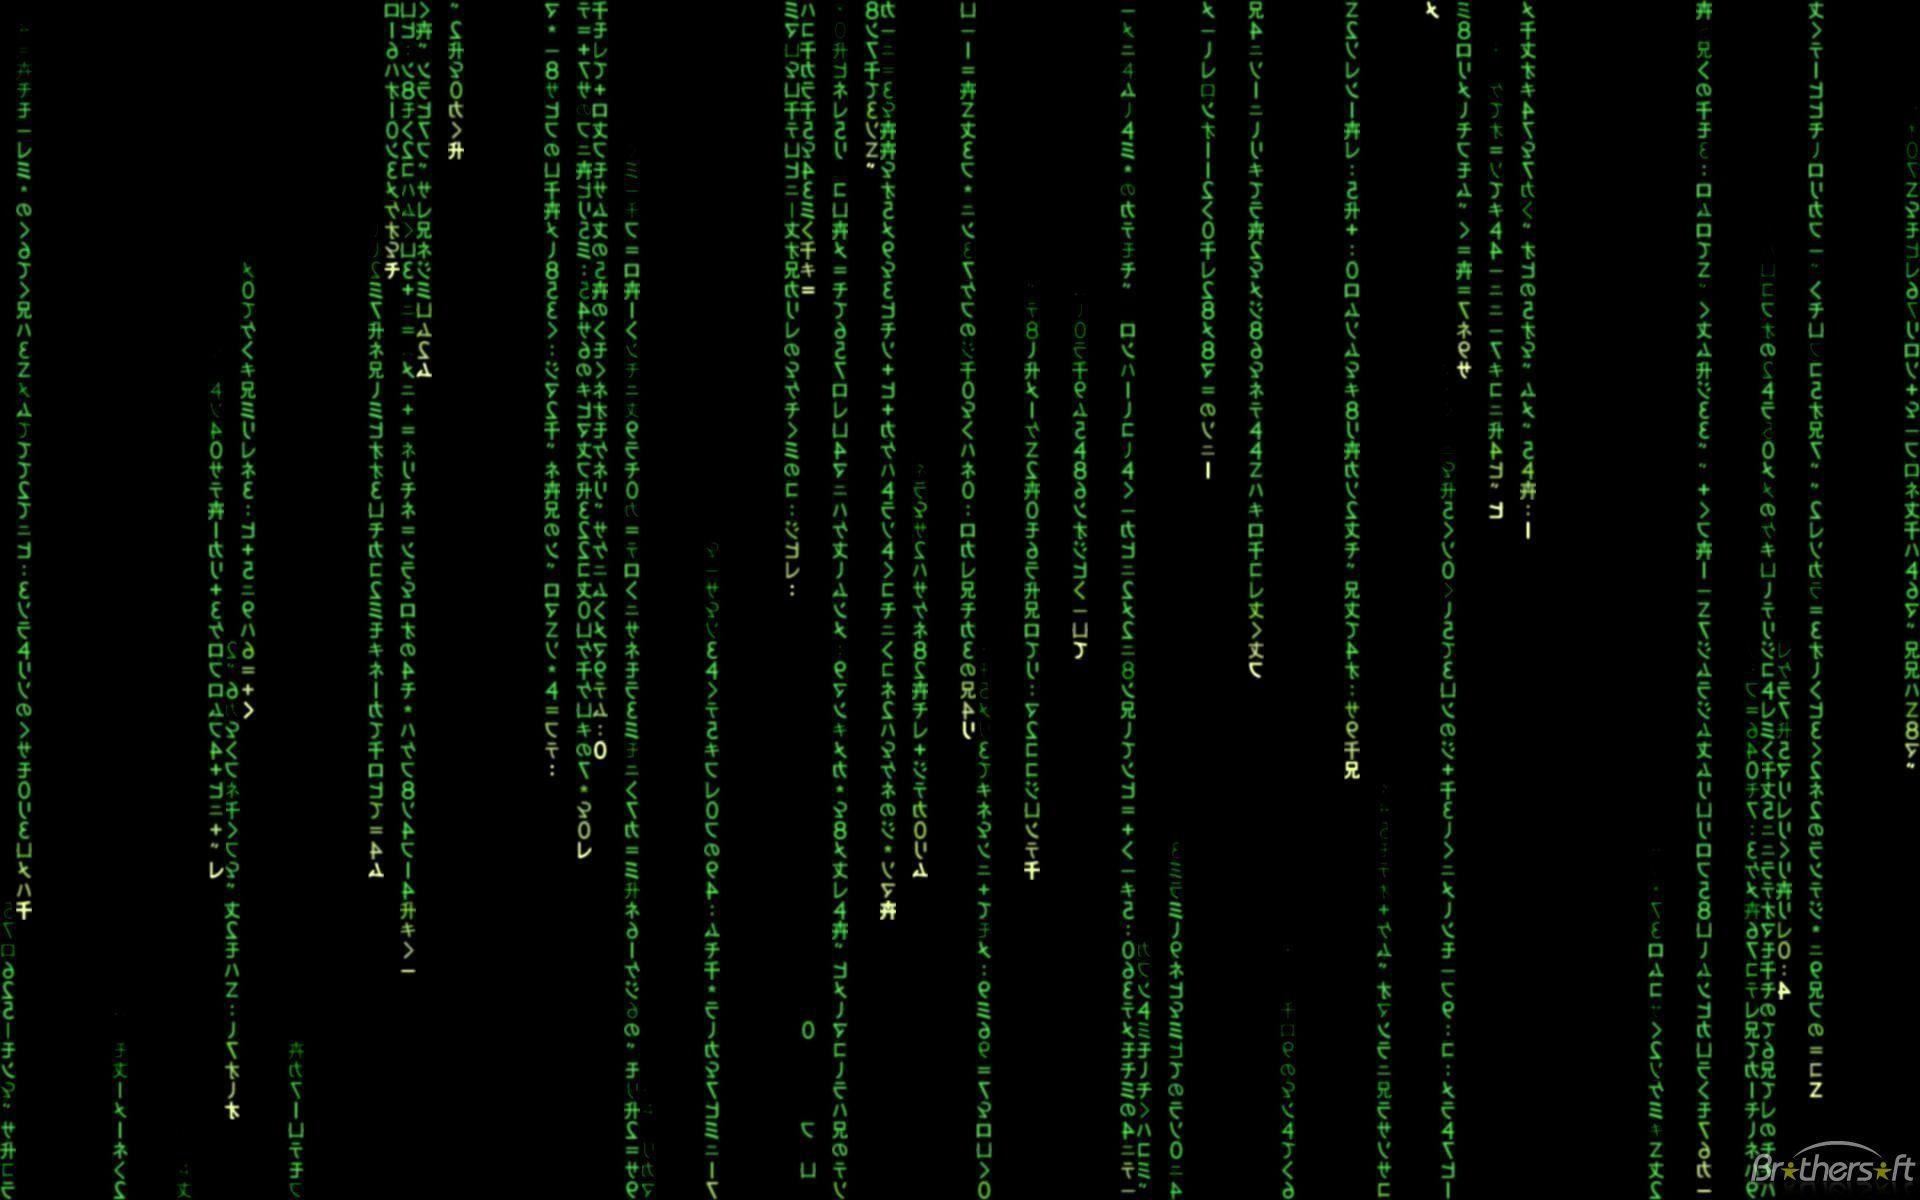 Animated Matrix Wallpaper Most Beautiful Wallpaper Windows